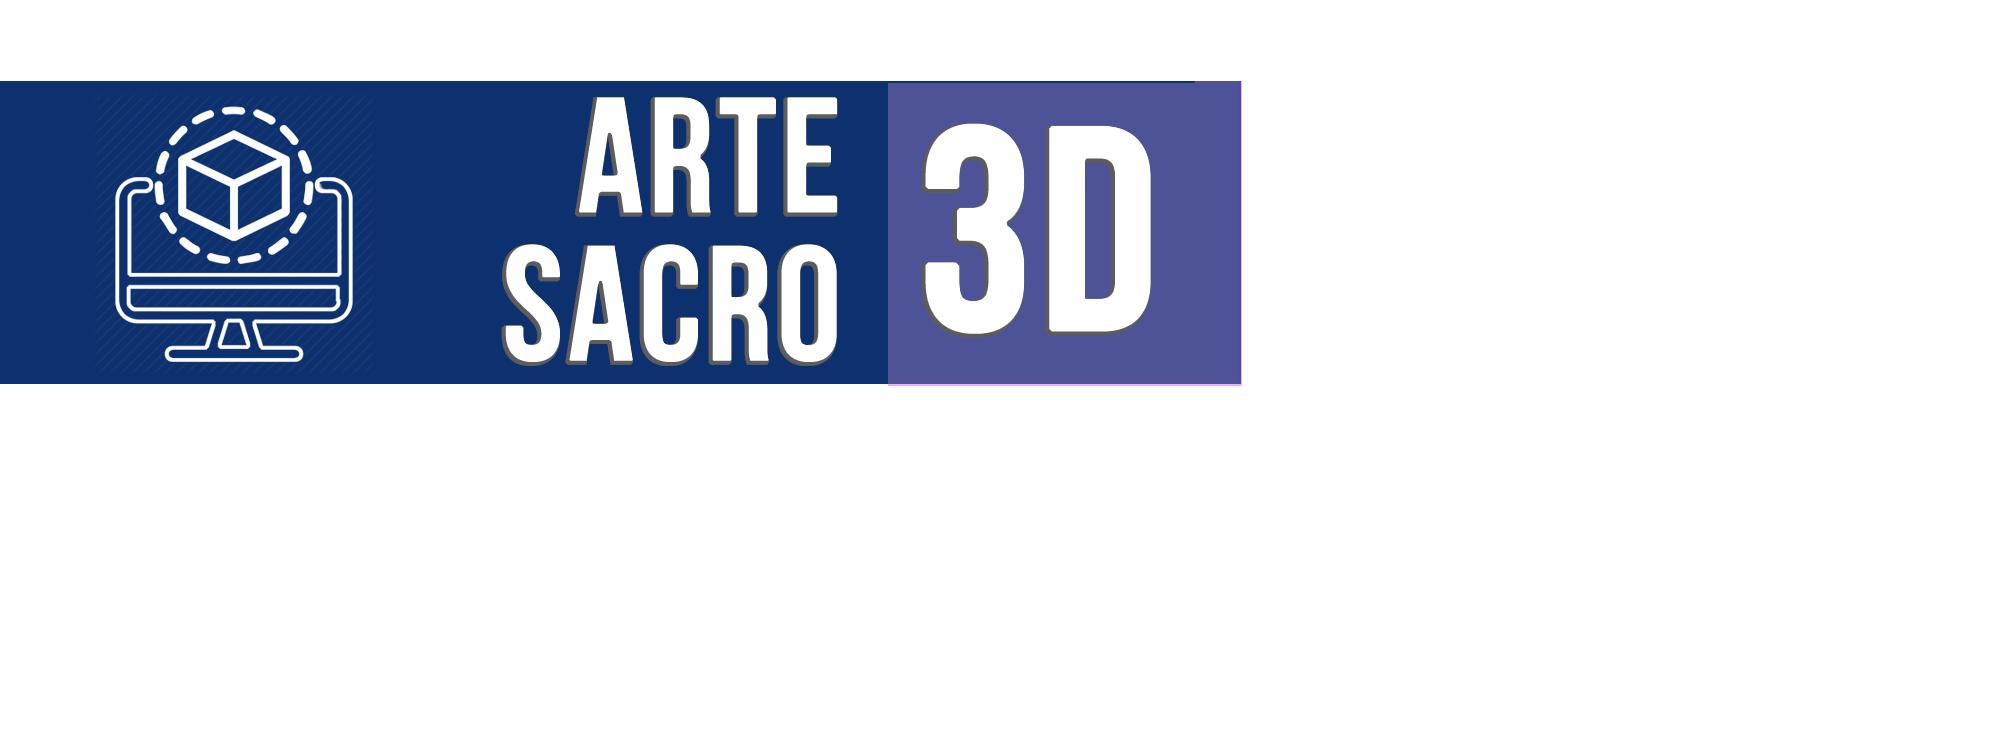 Portada Inicio 2 Arte Sacro 3D - Todo 3D Mystic Design S.L